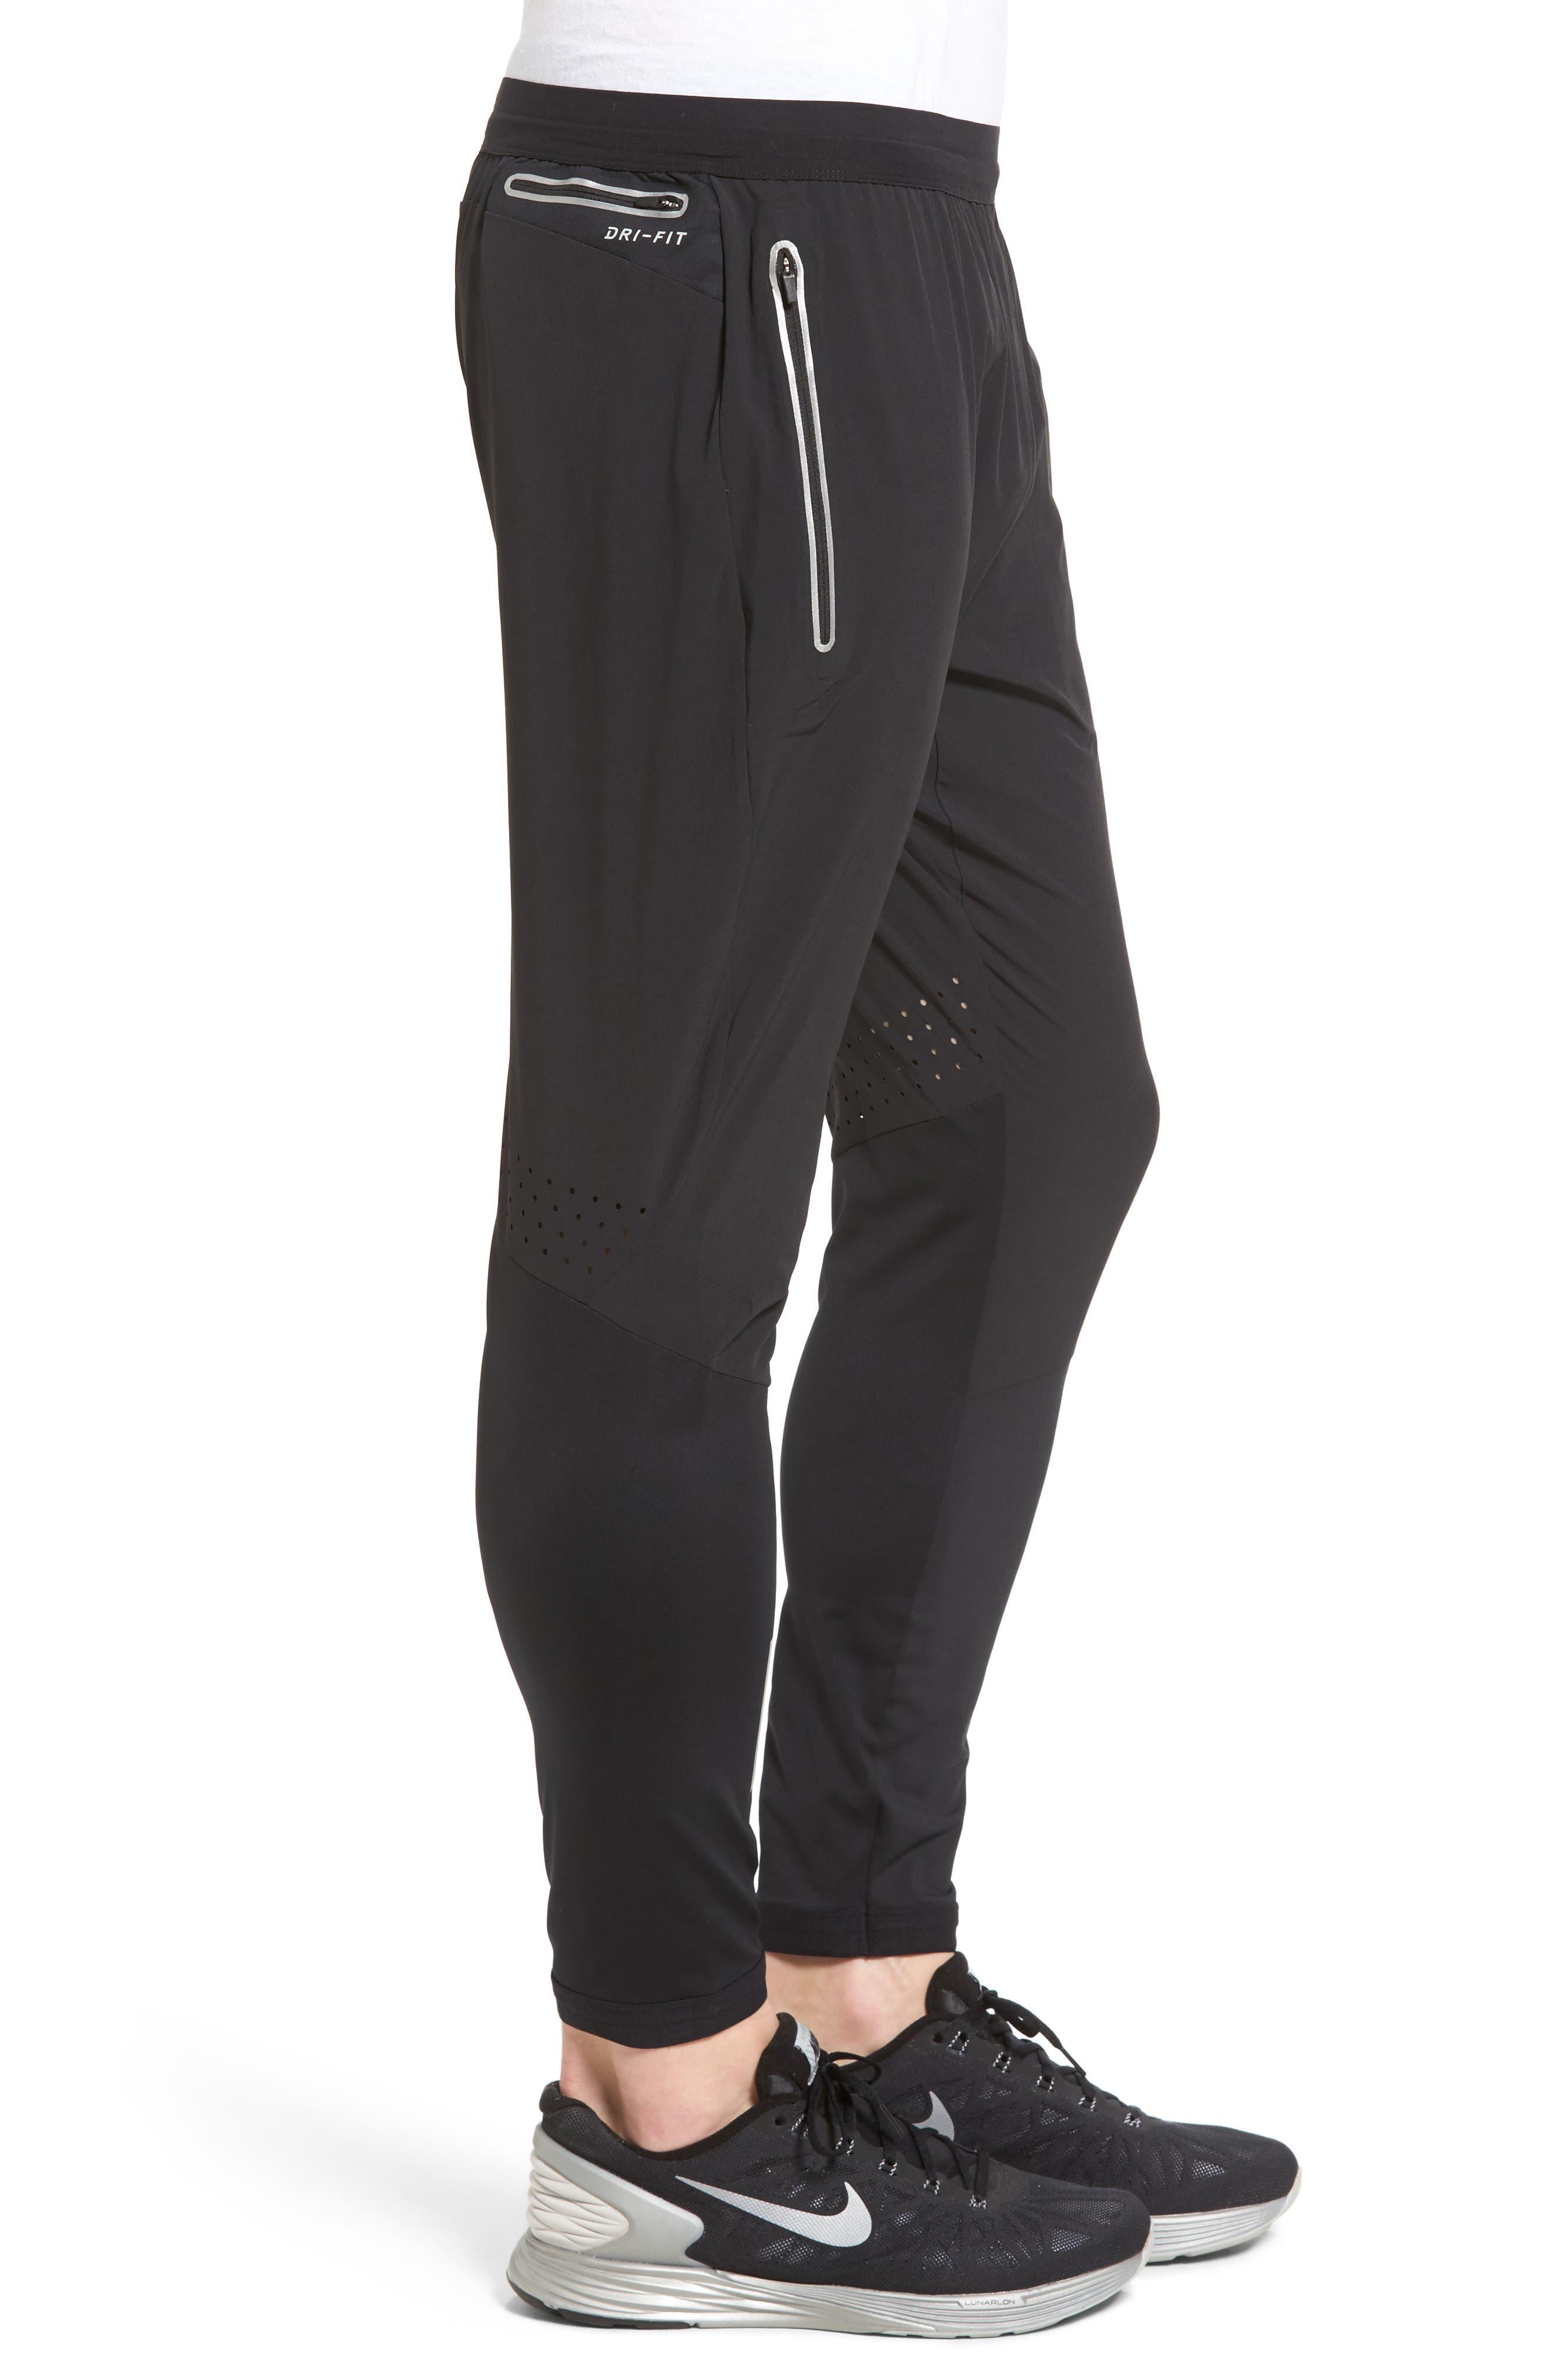 Flex Running Pants,                             Alternate thumbnail 3, color,                             BLACK/ PURE PLATINUM